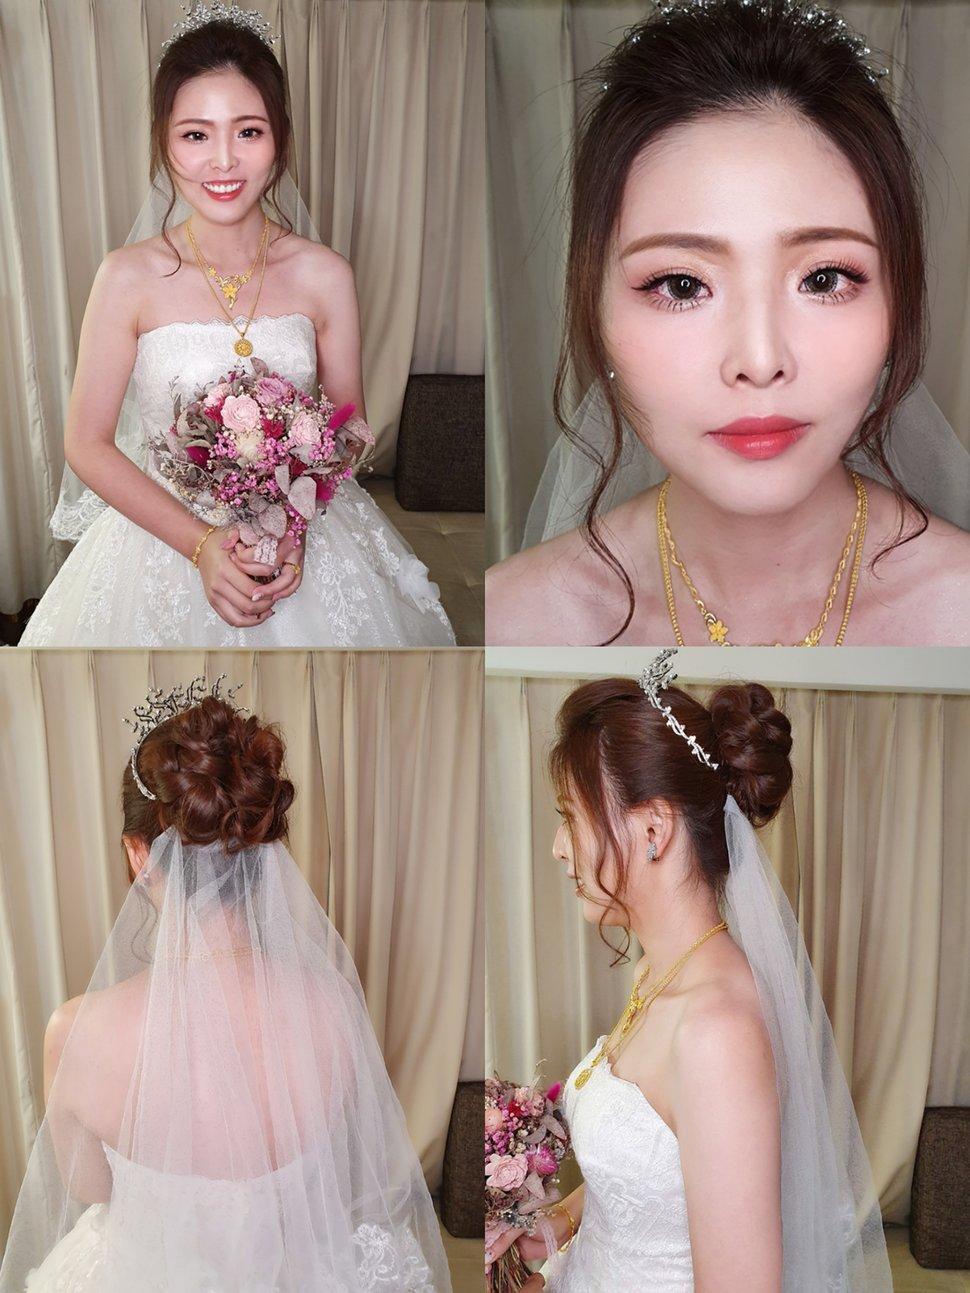 pt2019_07_09_16_29_05 - may beatuy 新娘秘書 整體造型《結婚吧》